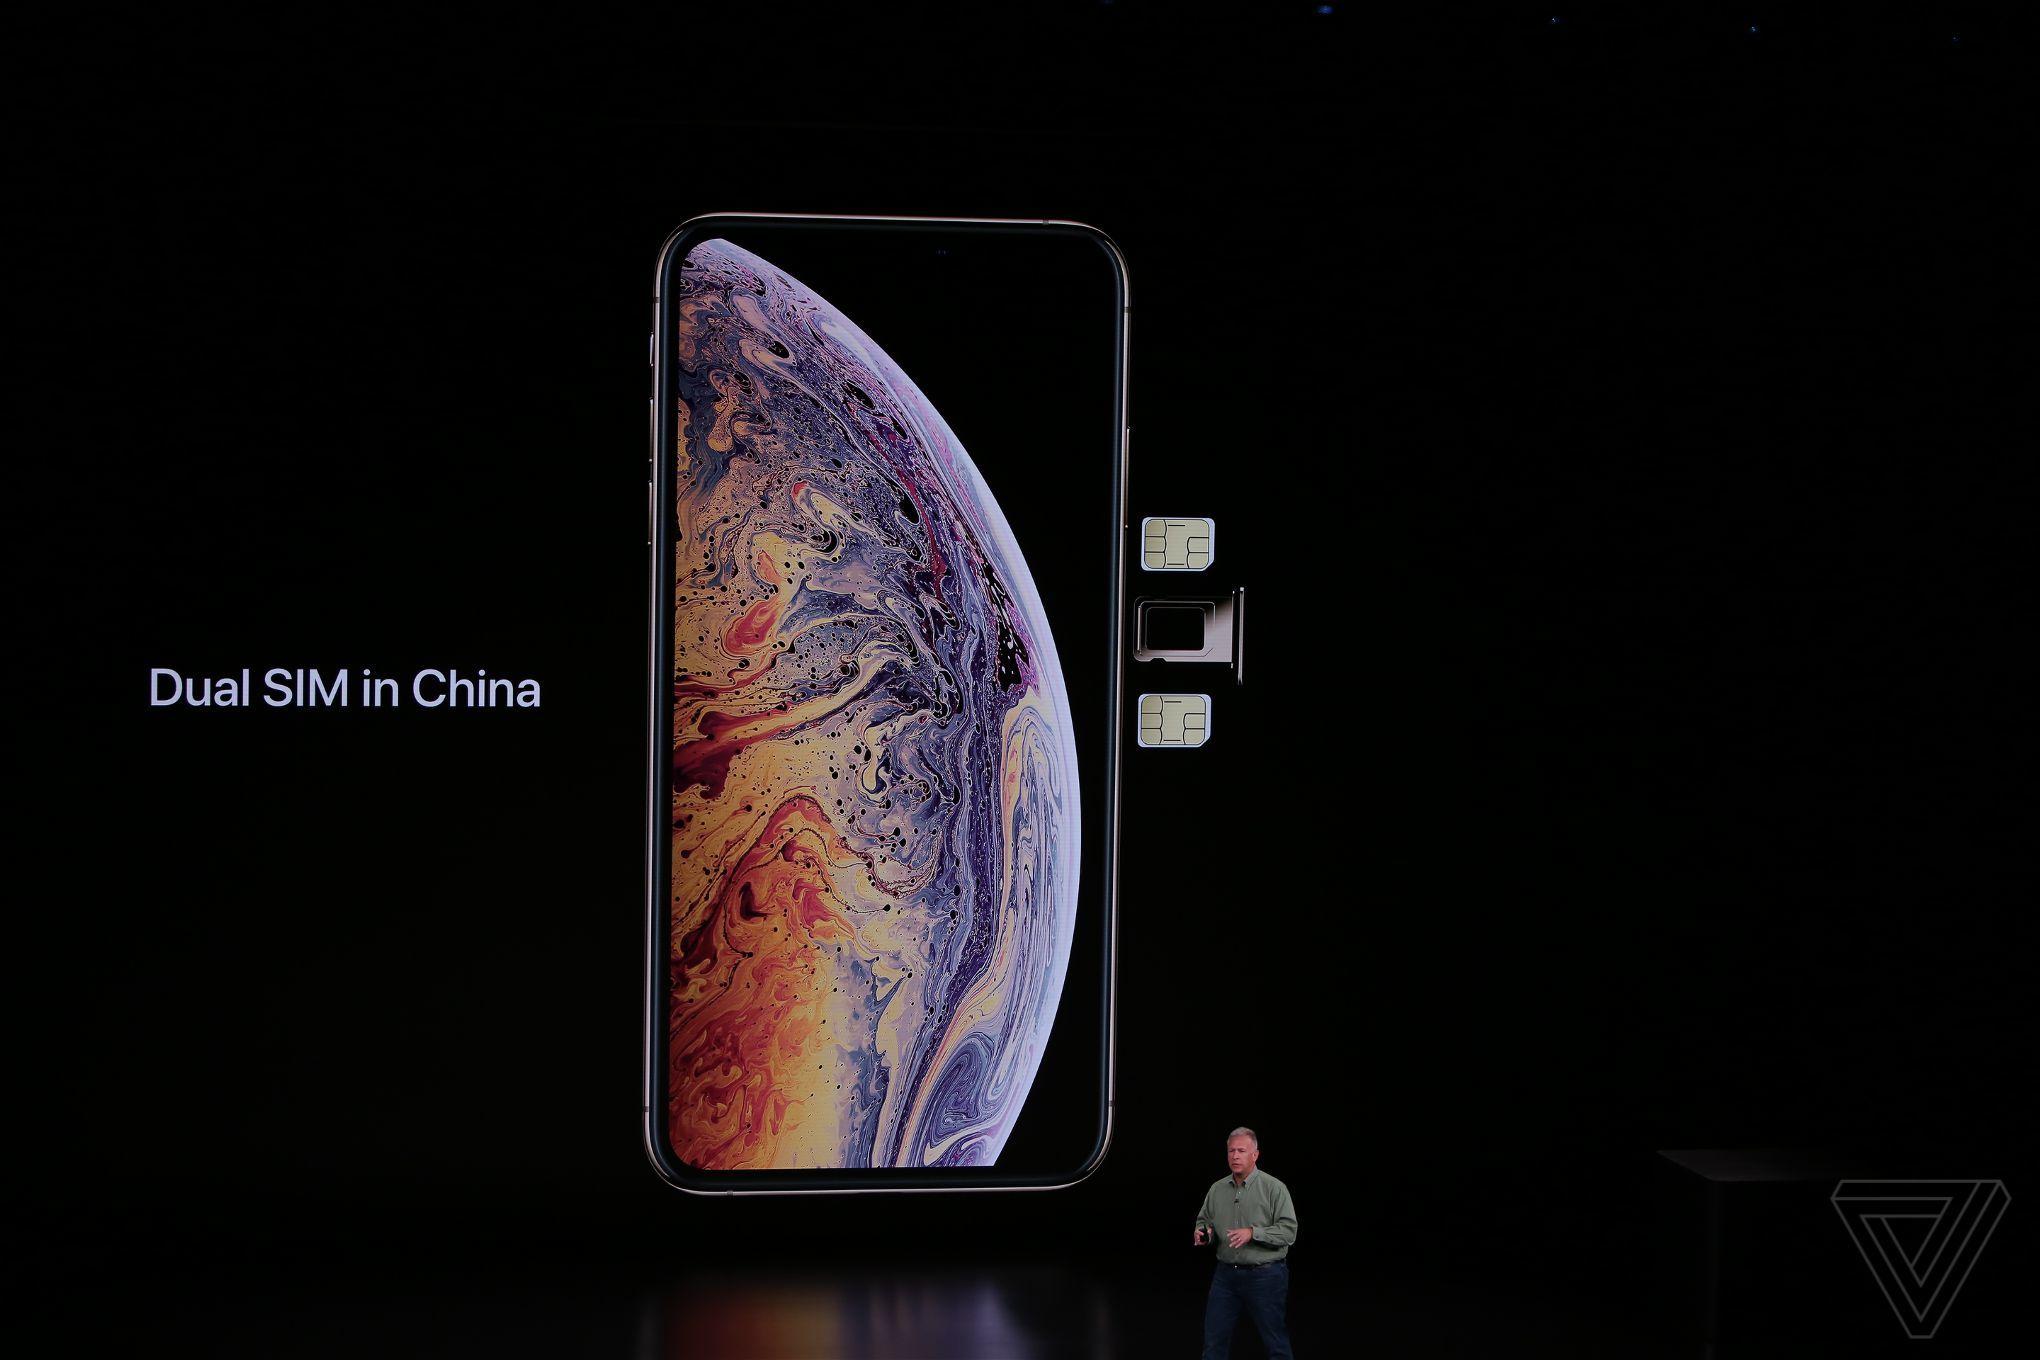 iPhone XS siiPhone XS Max dual-sim